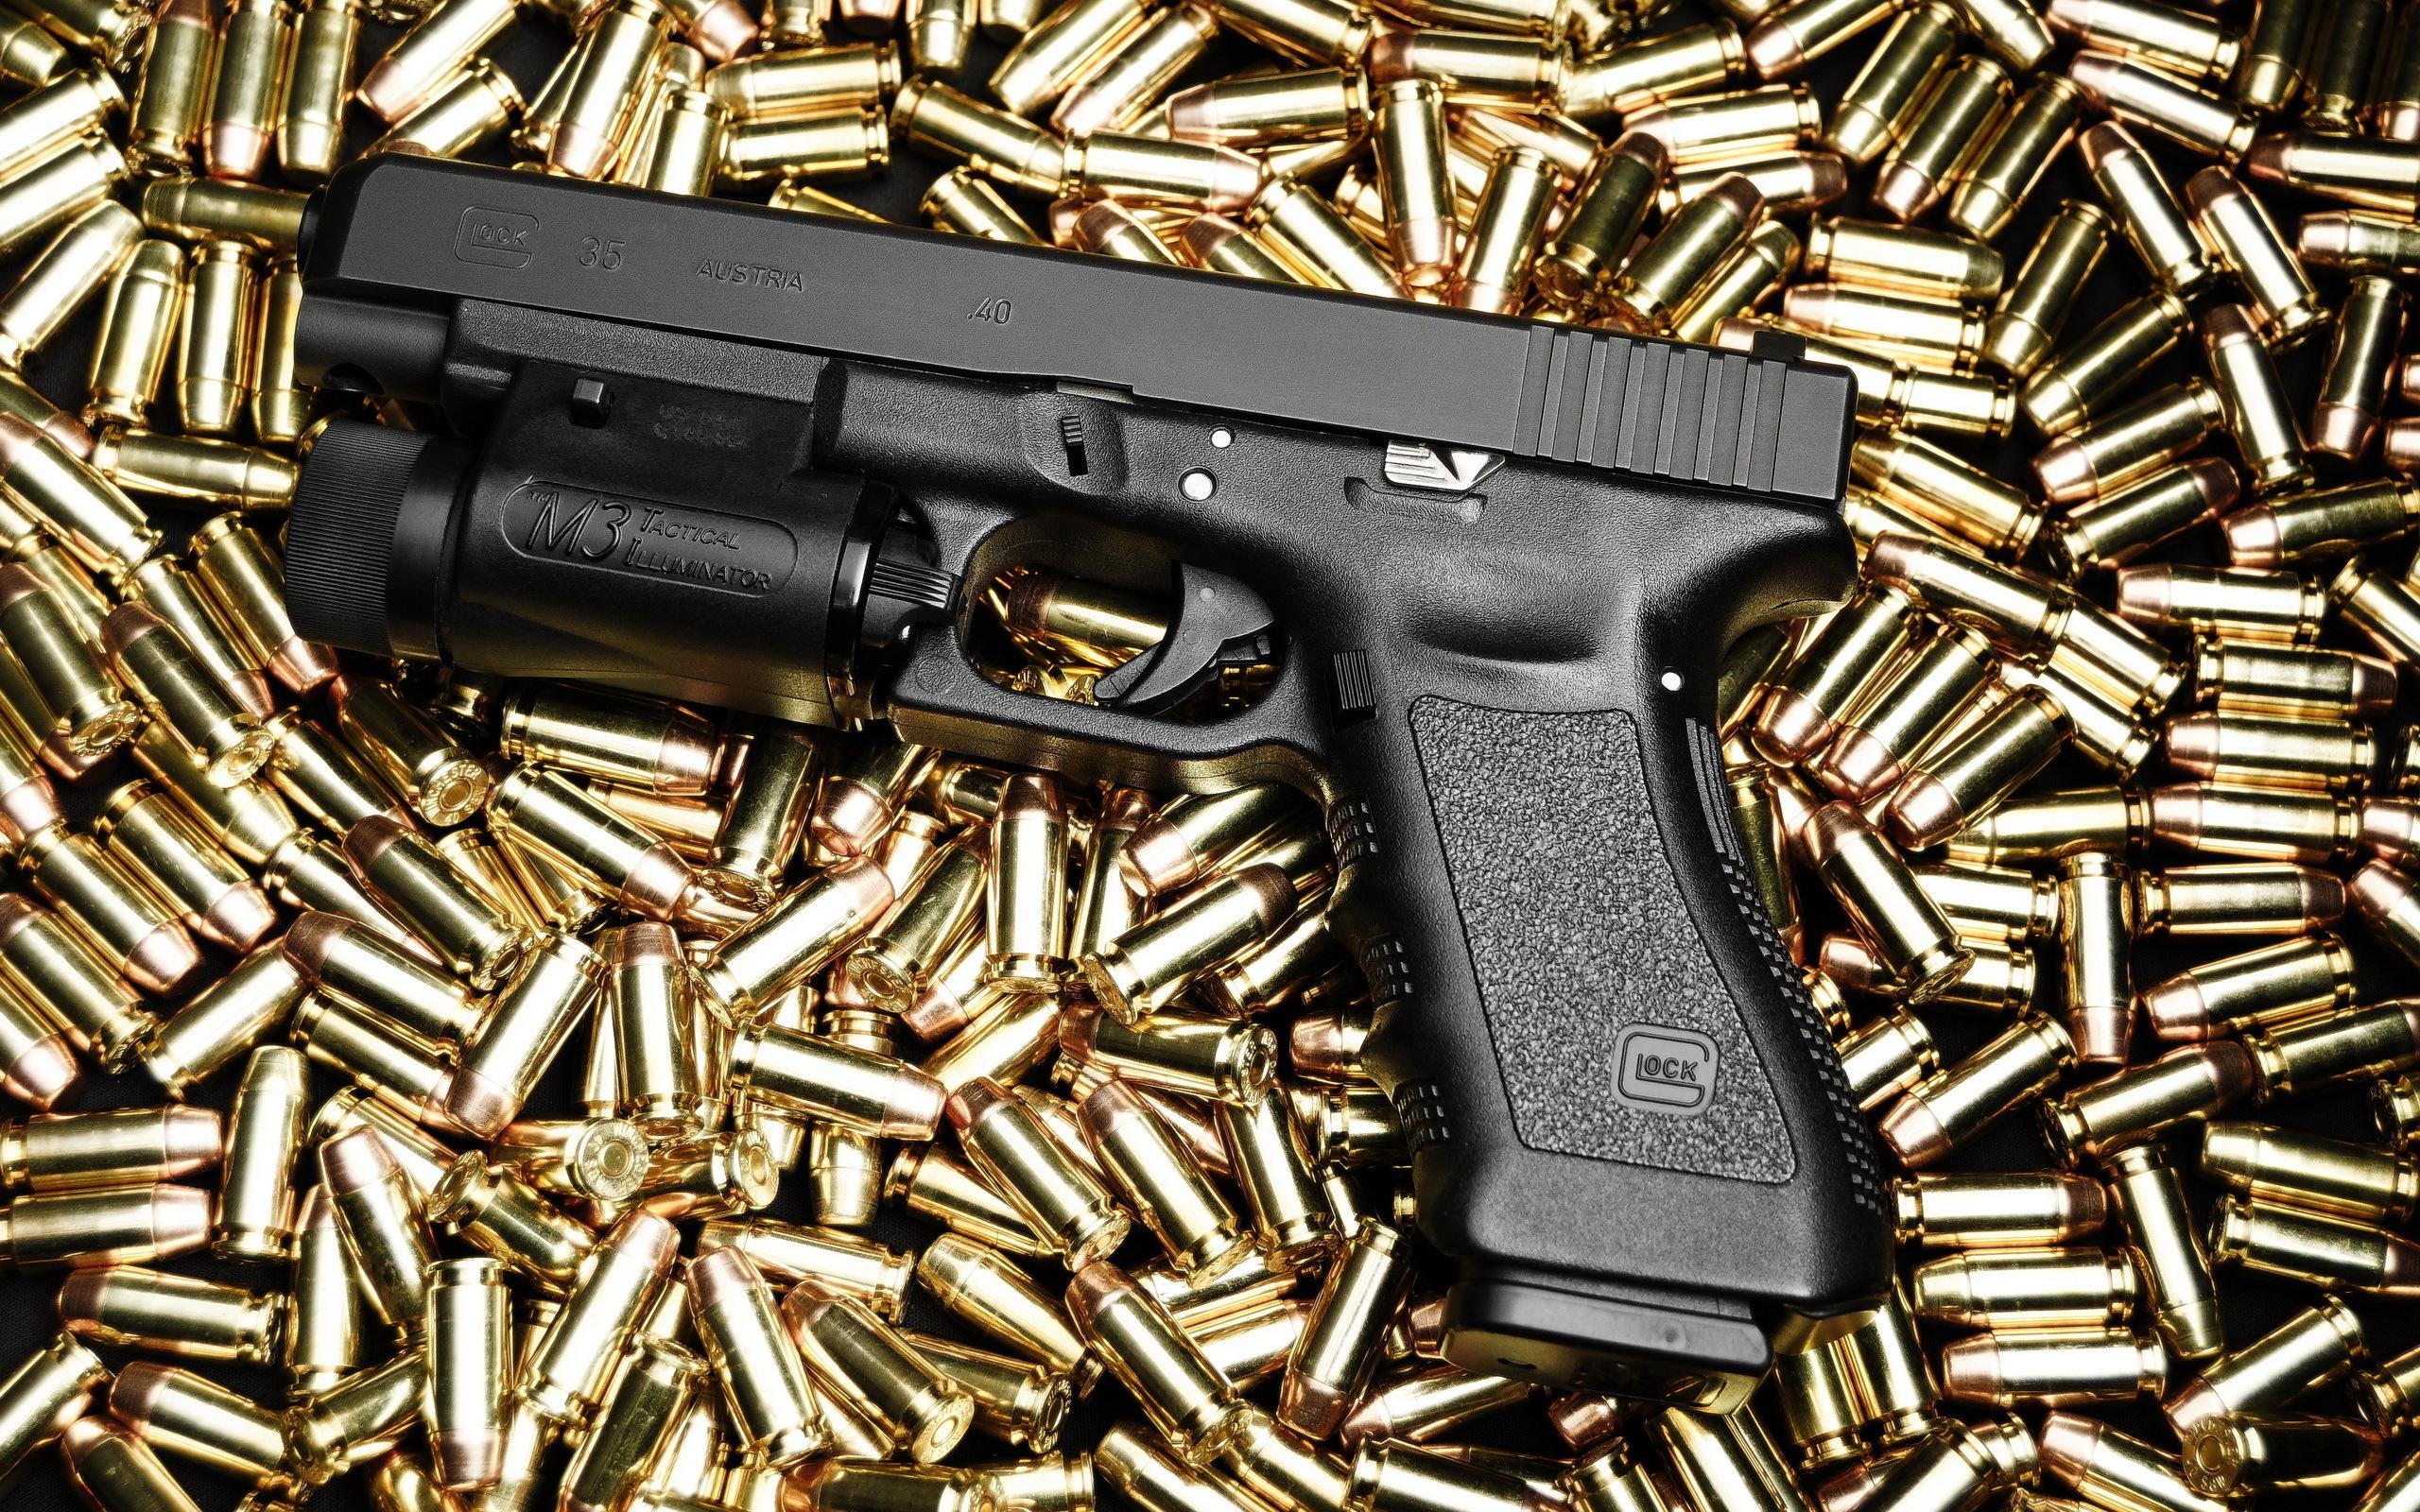 Glock 17 19 26 34 Full HD Wallpaper And